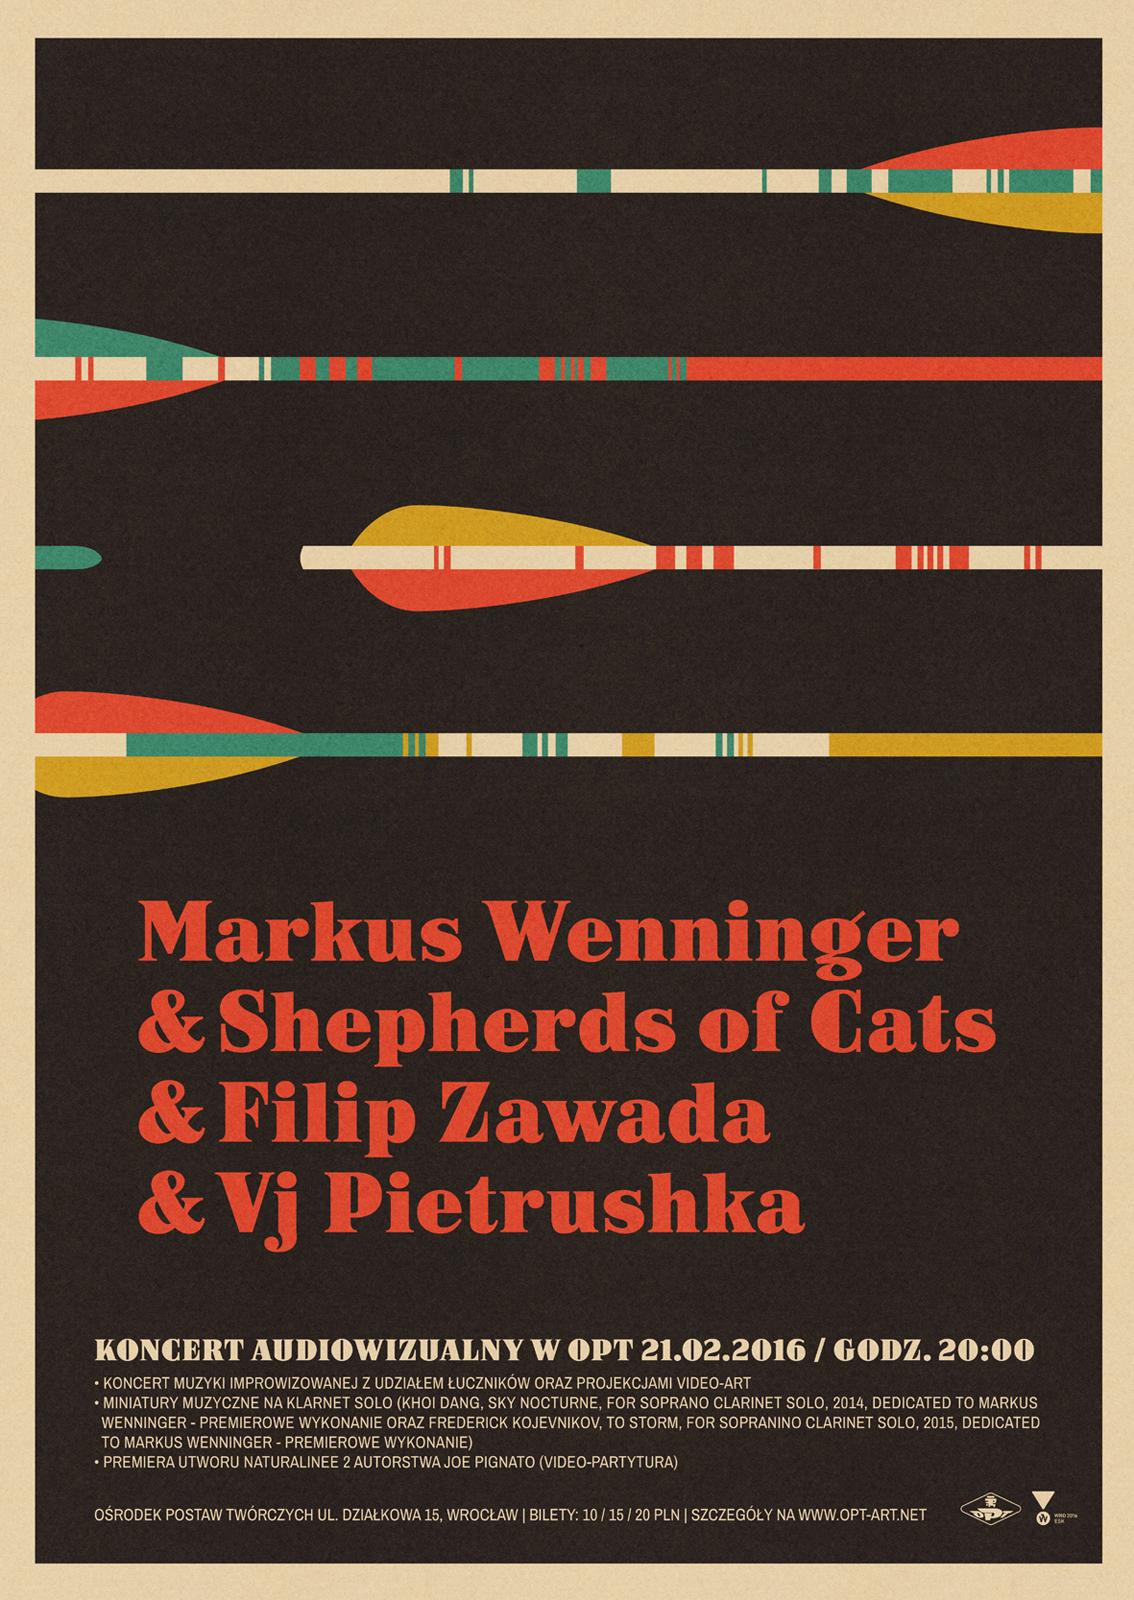 Markus Wenninger & Shepherds of Cats & Vj Pietrushka & Filip Zawada